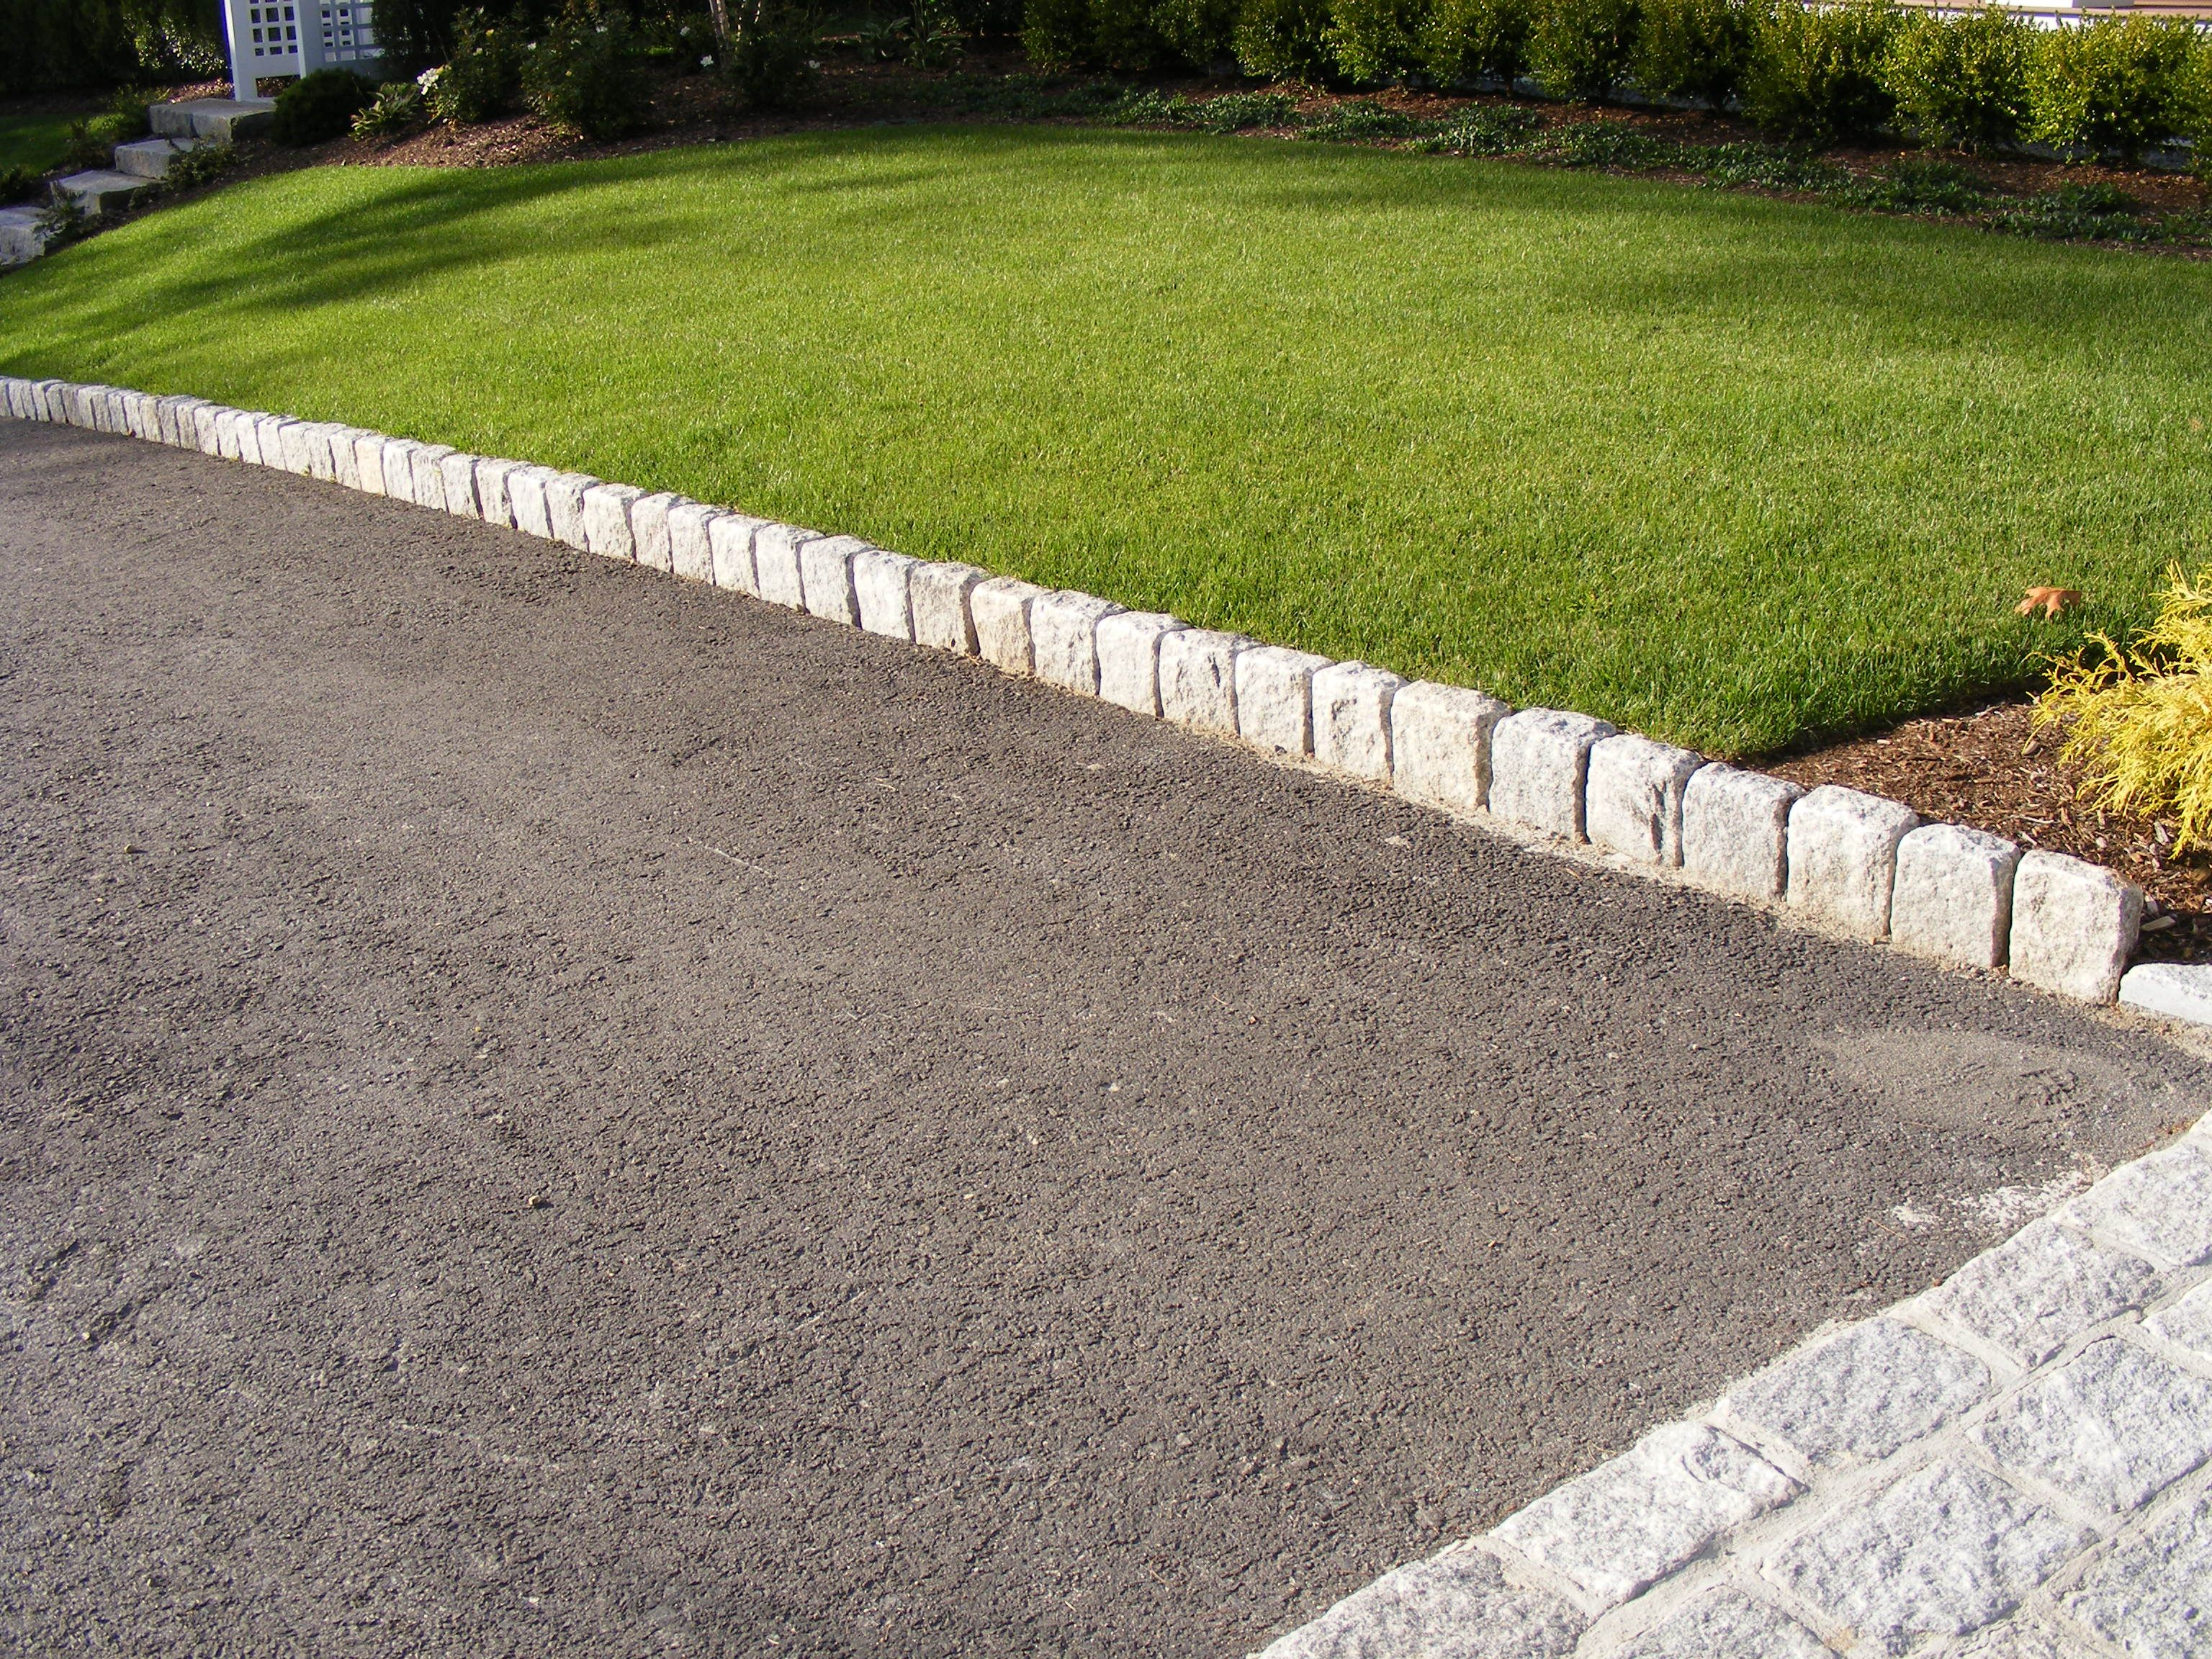 Driveway Edging Jumbo Cobblestones Used As Driveway